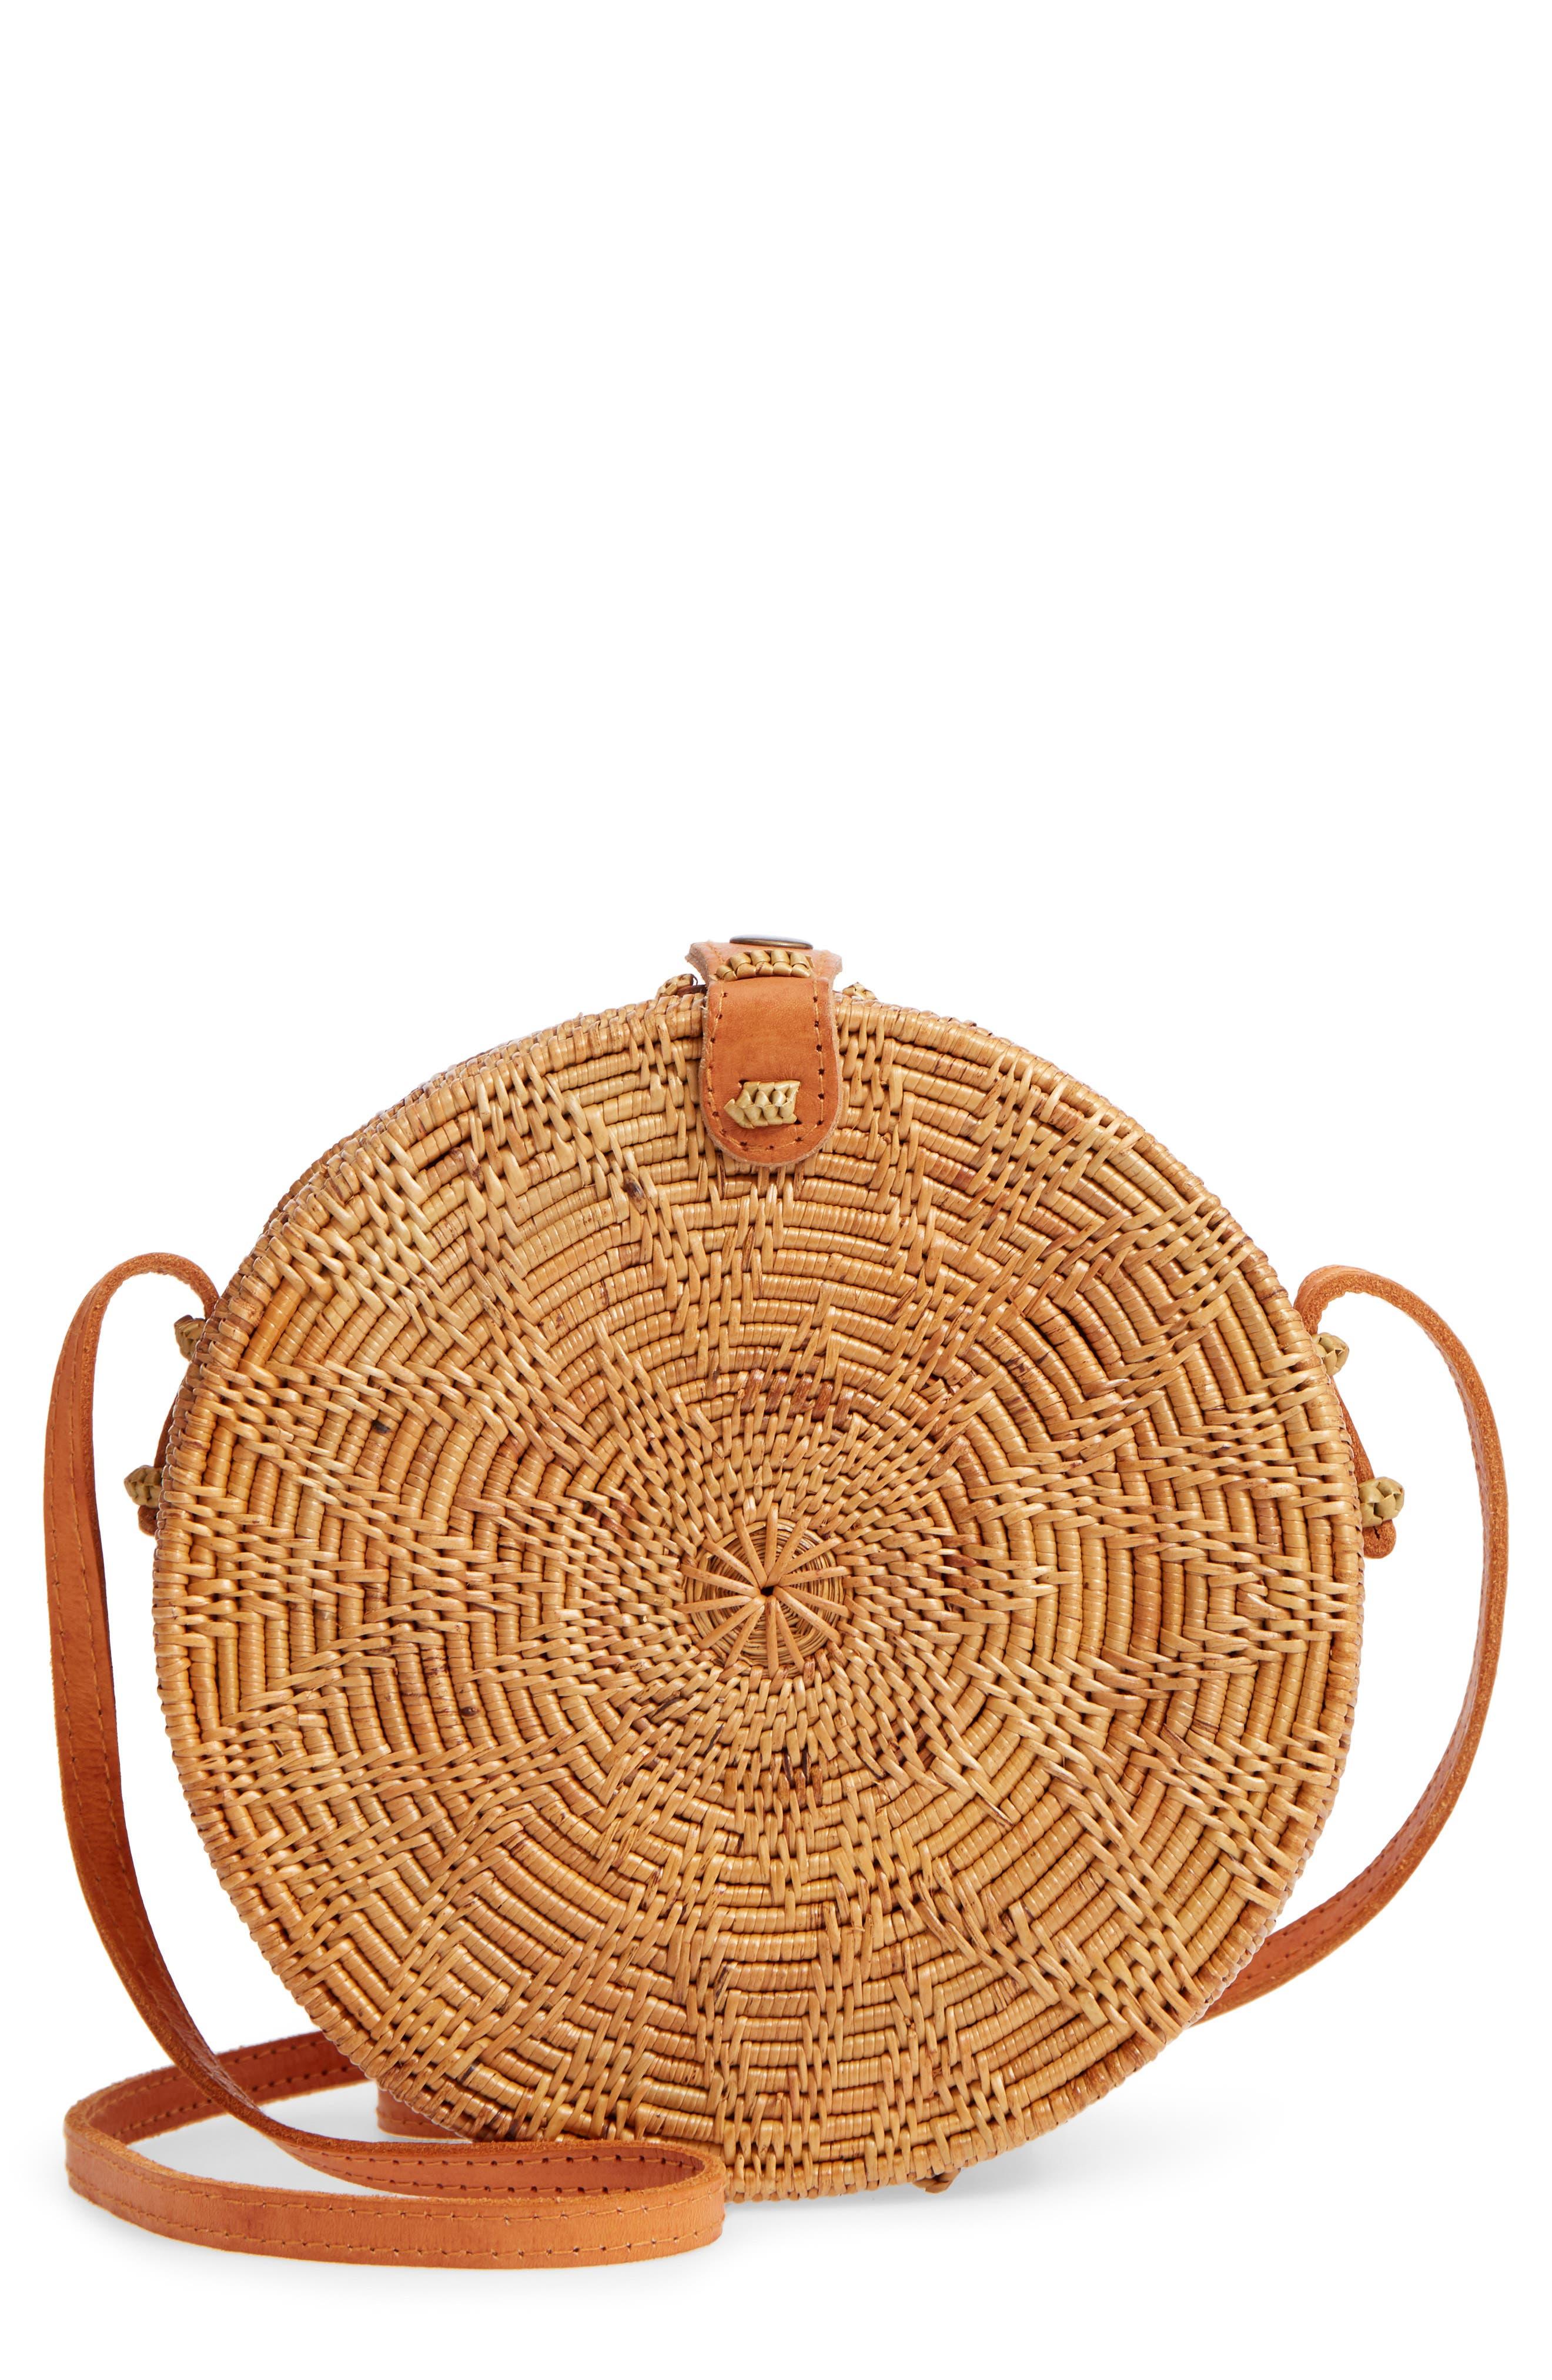 Woven Rattan Circle Basket Crossbody,                         Main,                         color, 200